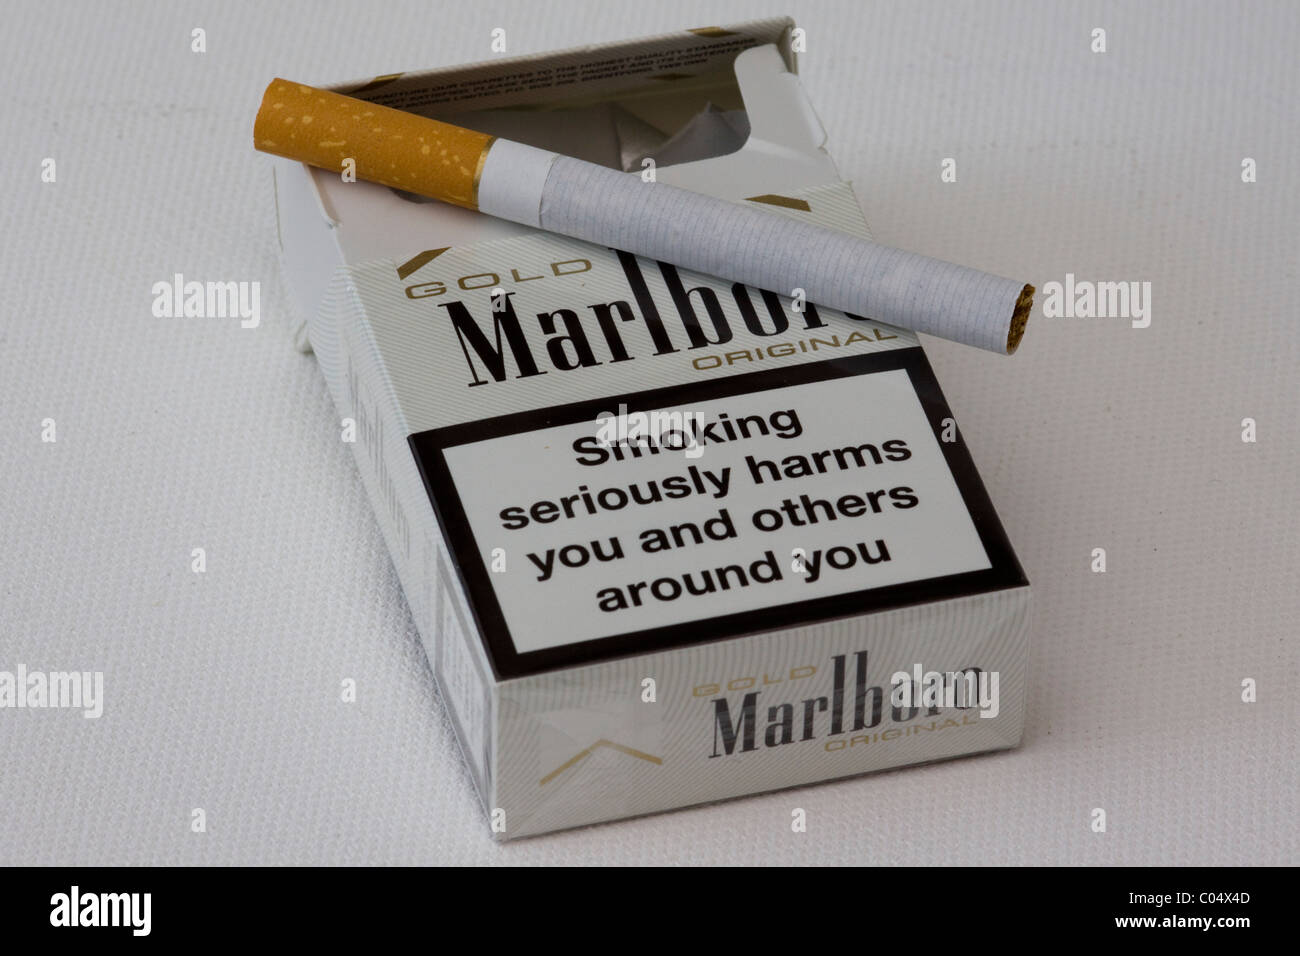 Davidoff cigarette name change